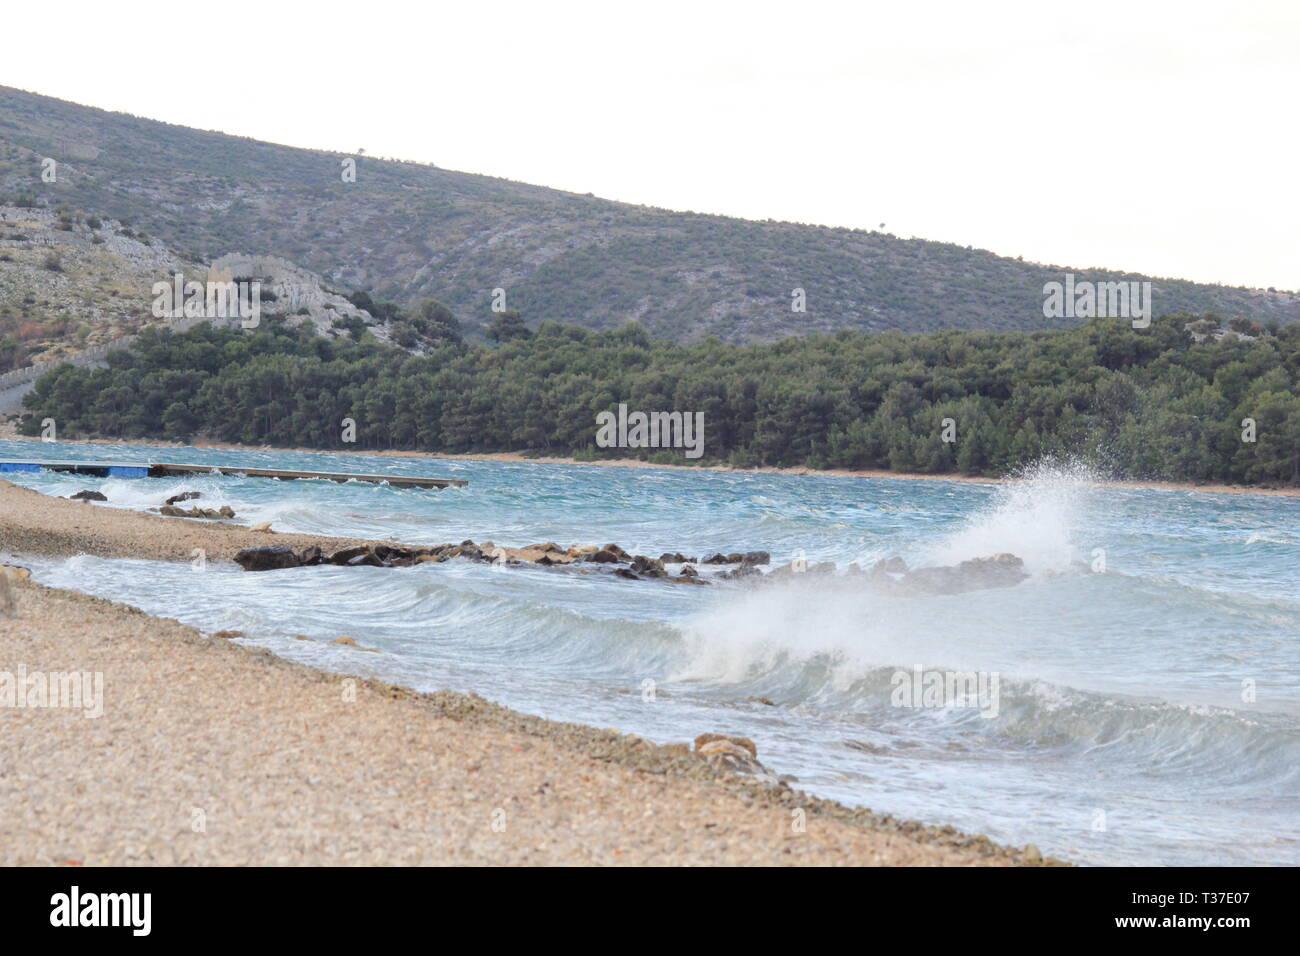 breathtaking moment at the croatian coast of the mediterran sea - Stock Image